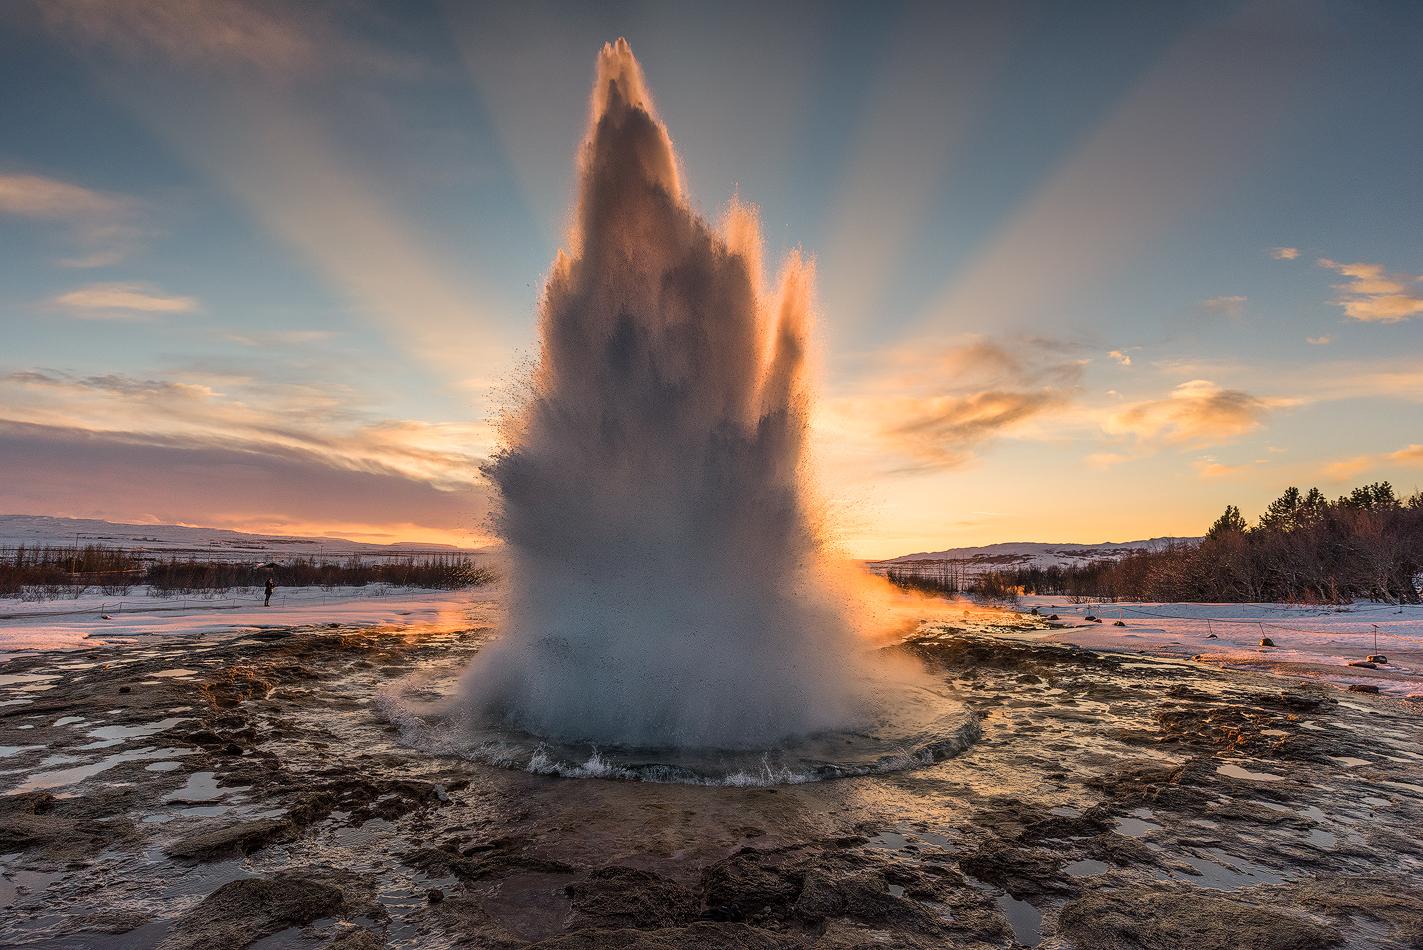 L'extraordinaire geyser de Strokkur éclate.